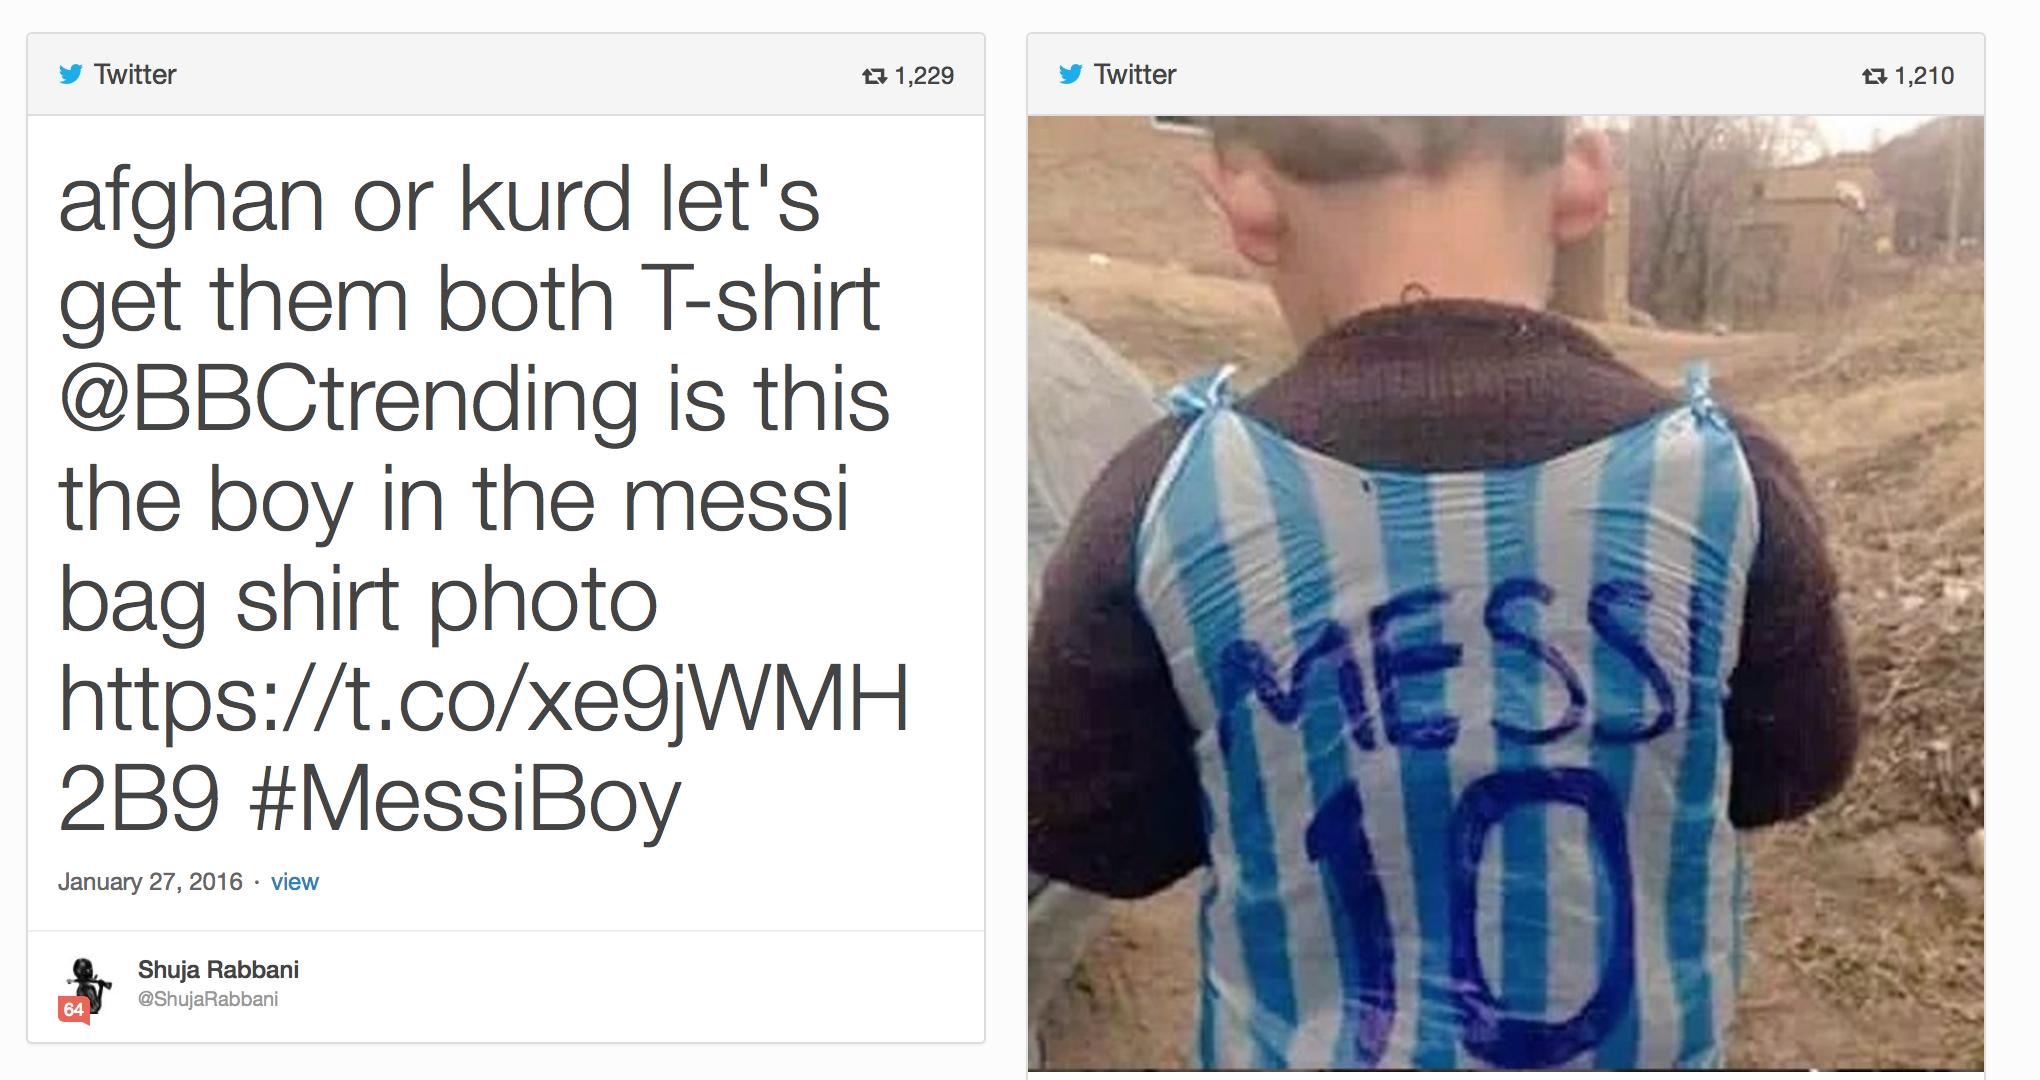 Messi's biggest fan tweet